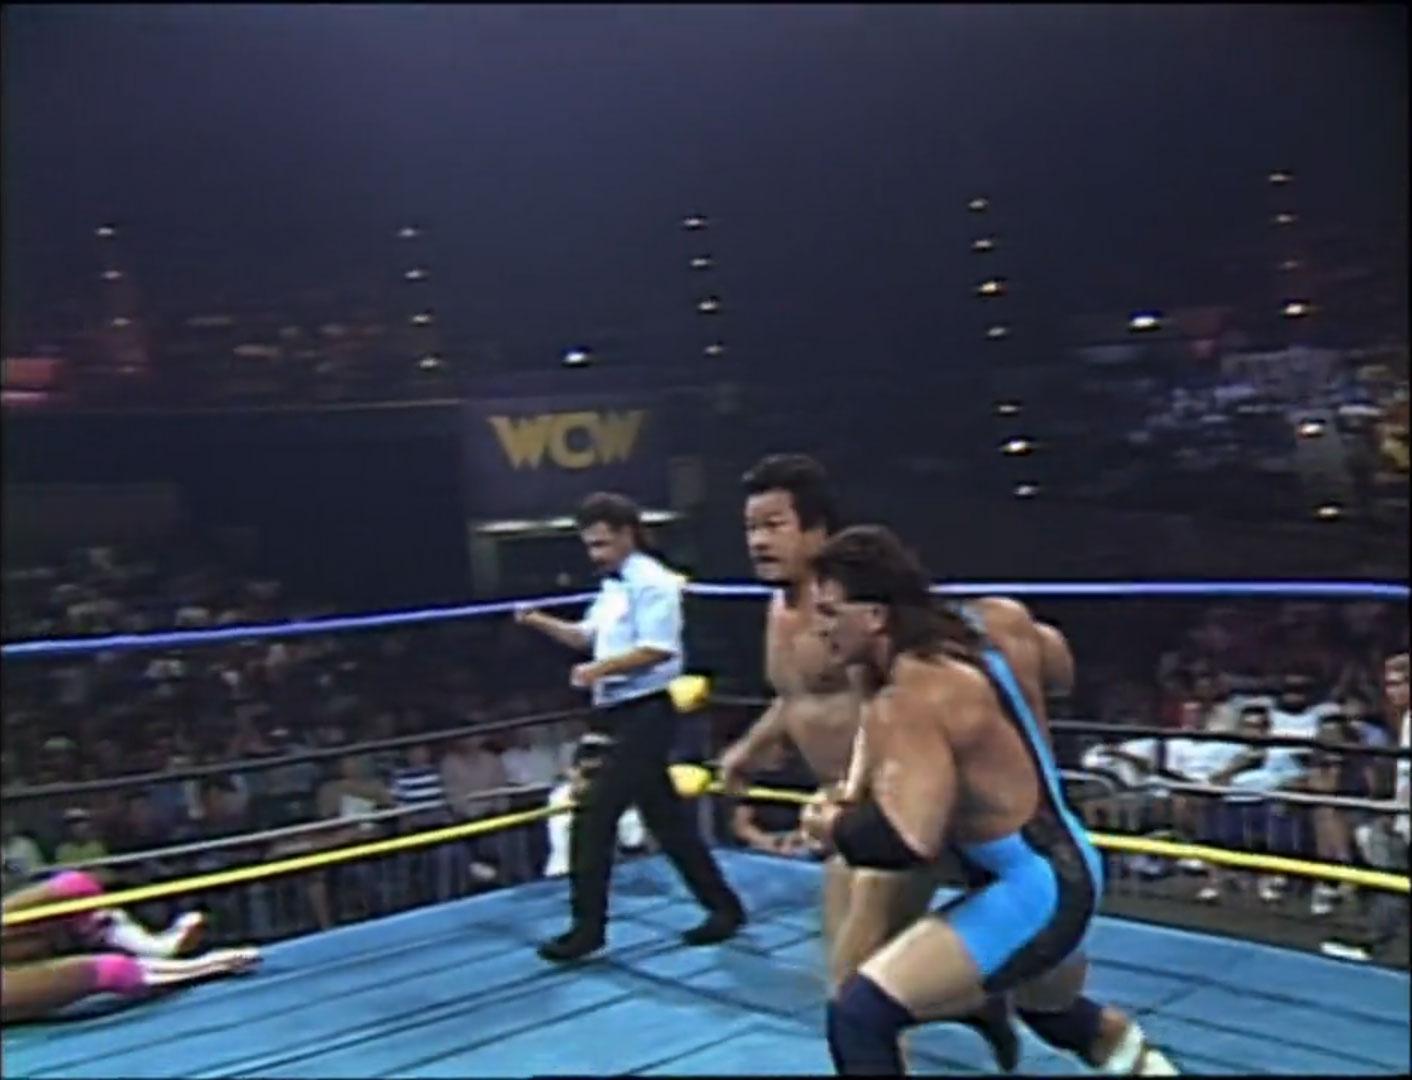 Steiner Brothers vs. Takayuki Iizuka & Tatsumi Fujinami WCW World Tag Team Championship WCW WrestleWar '92, May 17th 1992